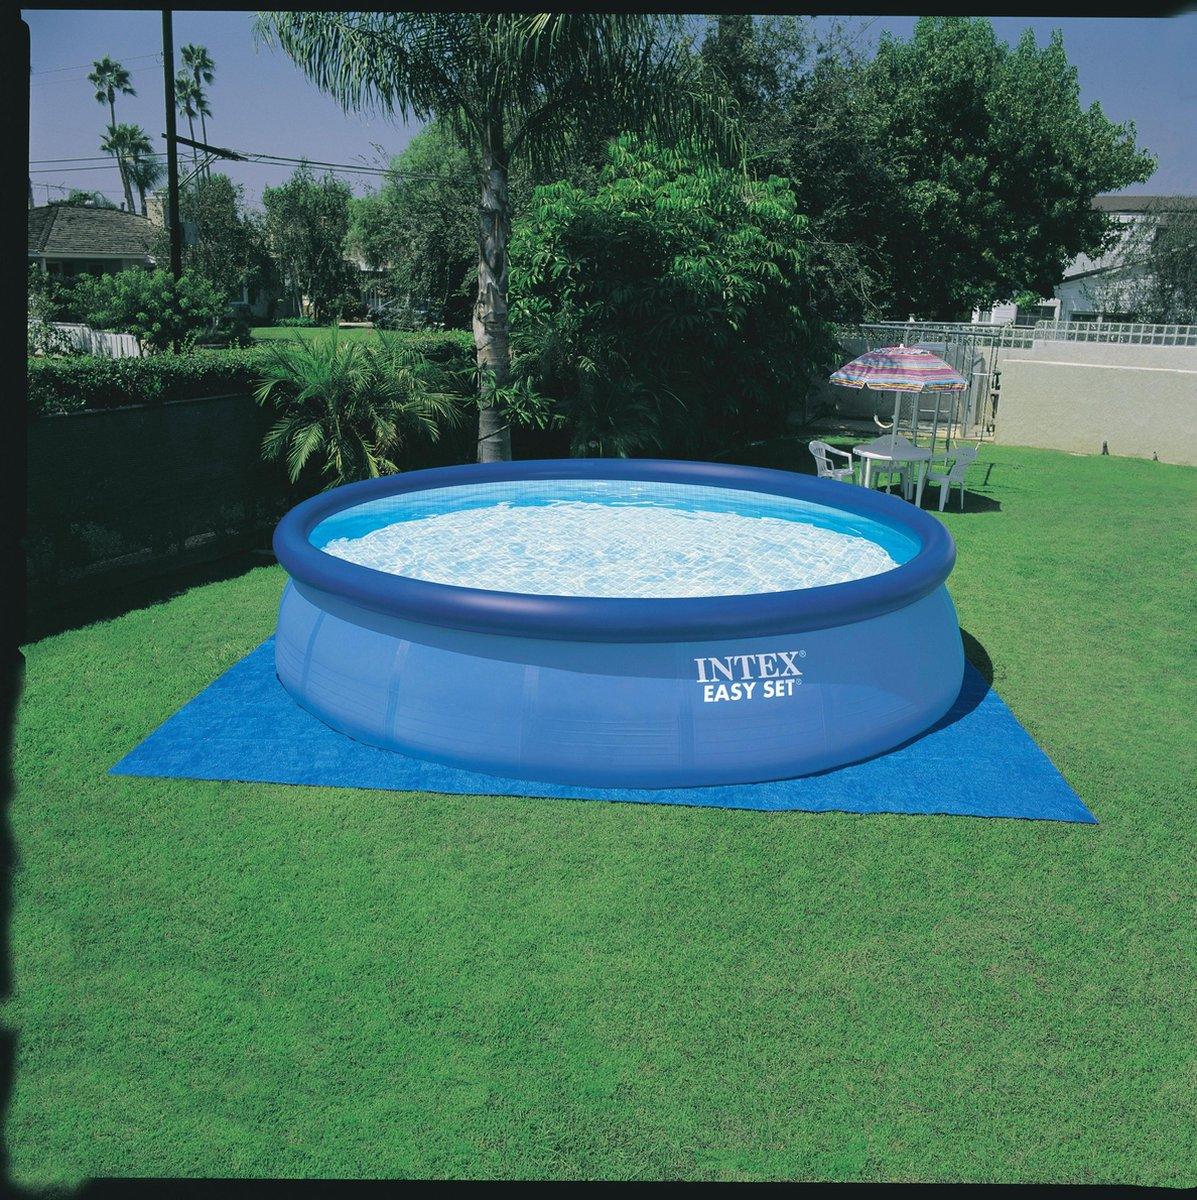 Opblaaszwembad - Intex - Easy Set - Familiezwembadbad - Ø 457 x 84 Cm - Inclusief 12Volt Filterpomp